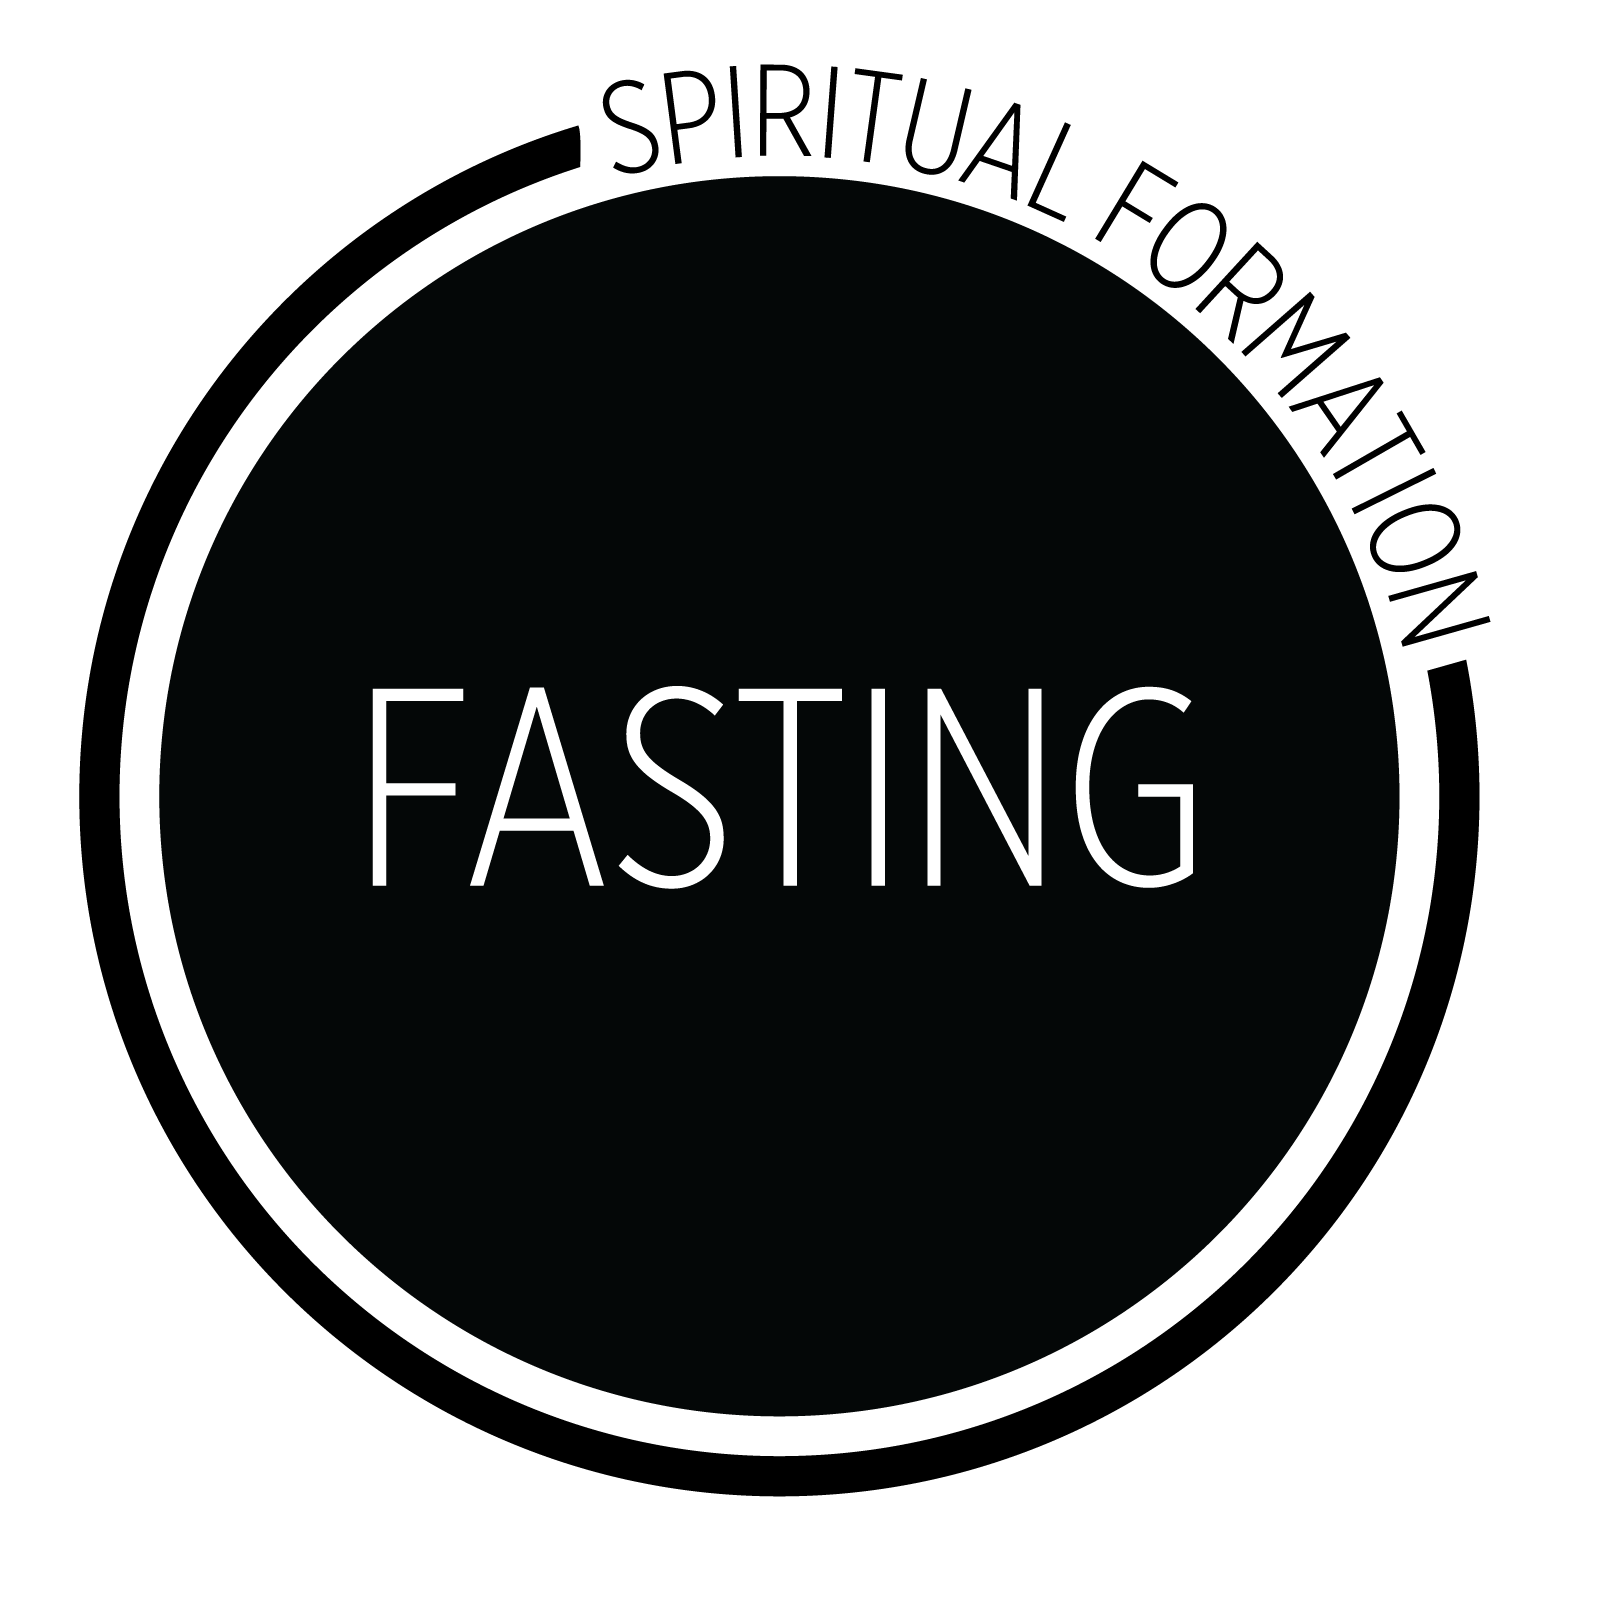 Fasting-Icon